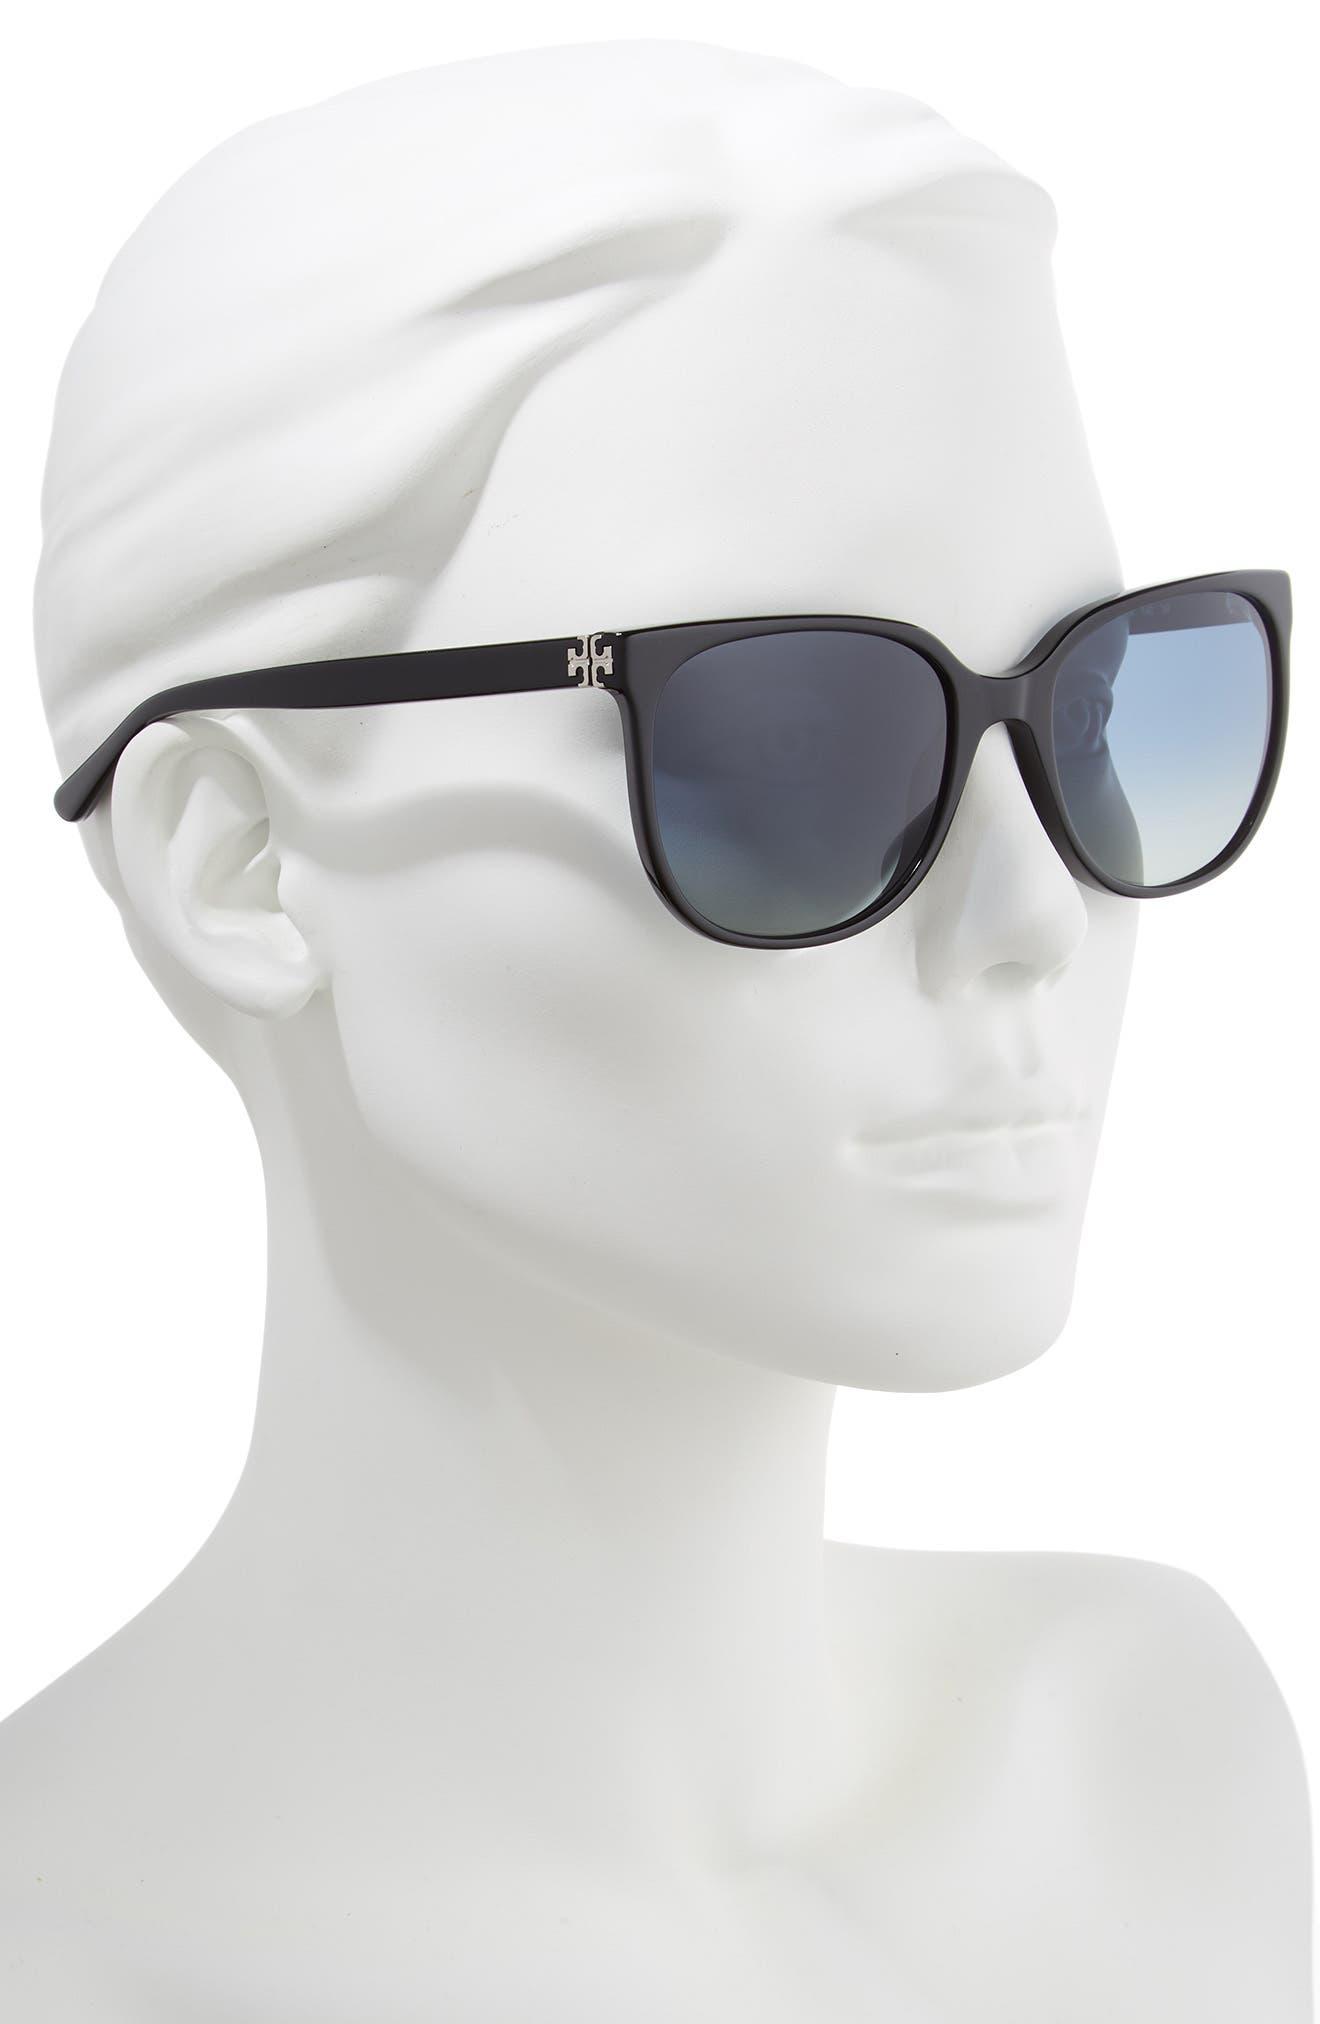 TORY BURCH, Revo 57mm Polarized Square Sunglasses, Alternate thumbnail 2, color, 001